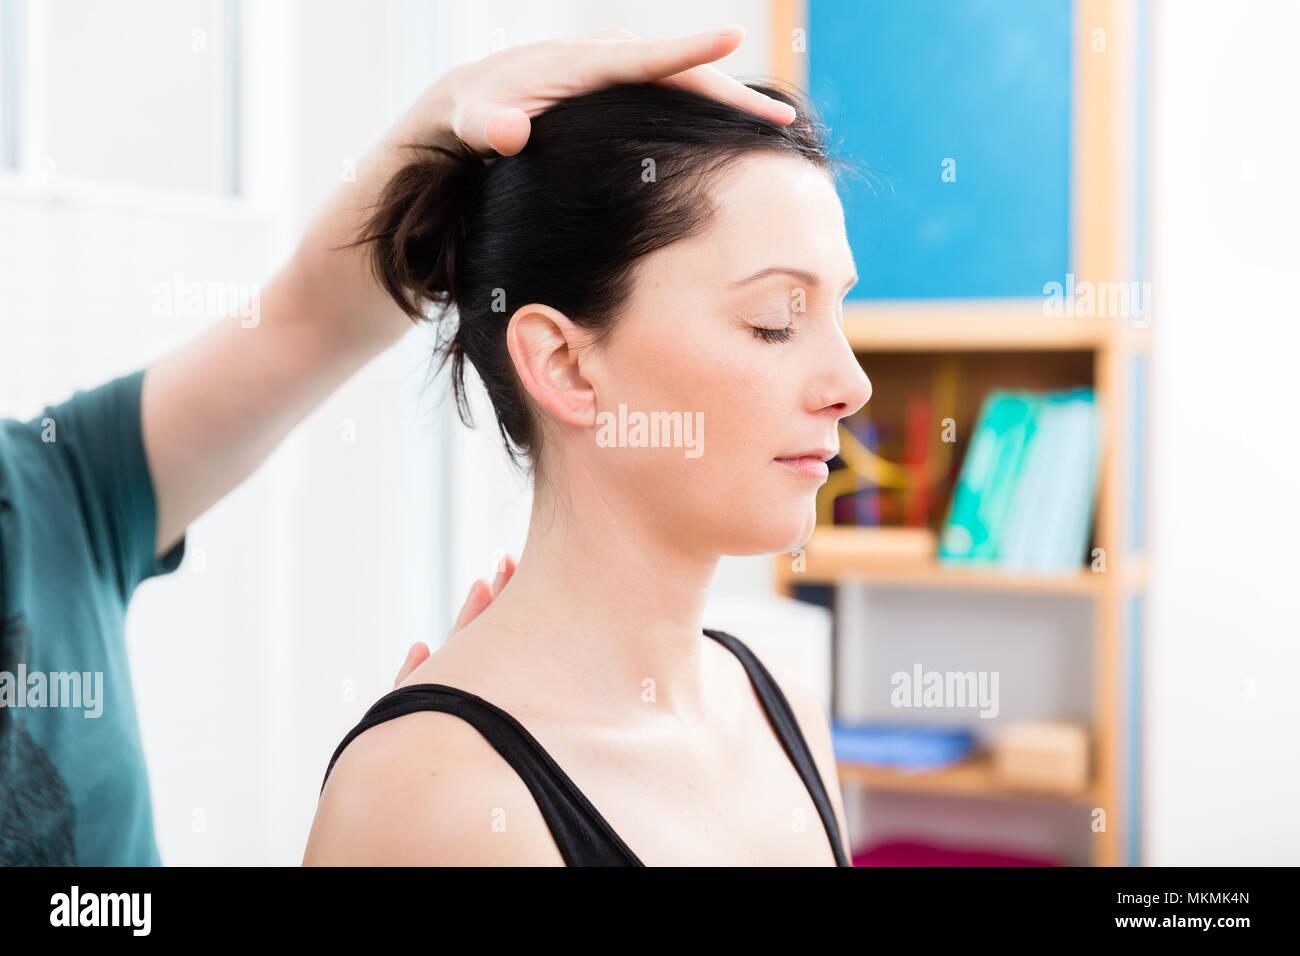 Woman having head massage from physiotherapist - Stock Image